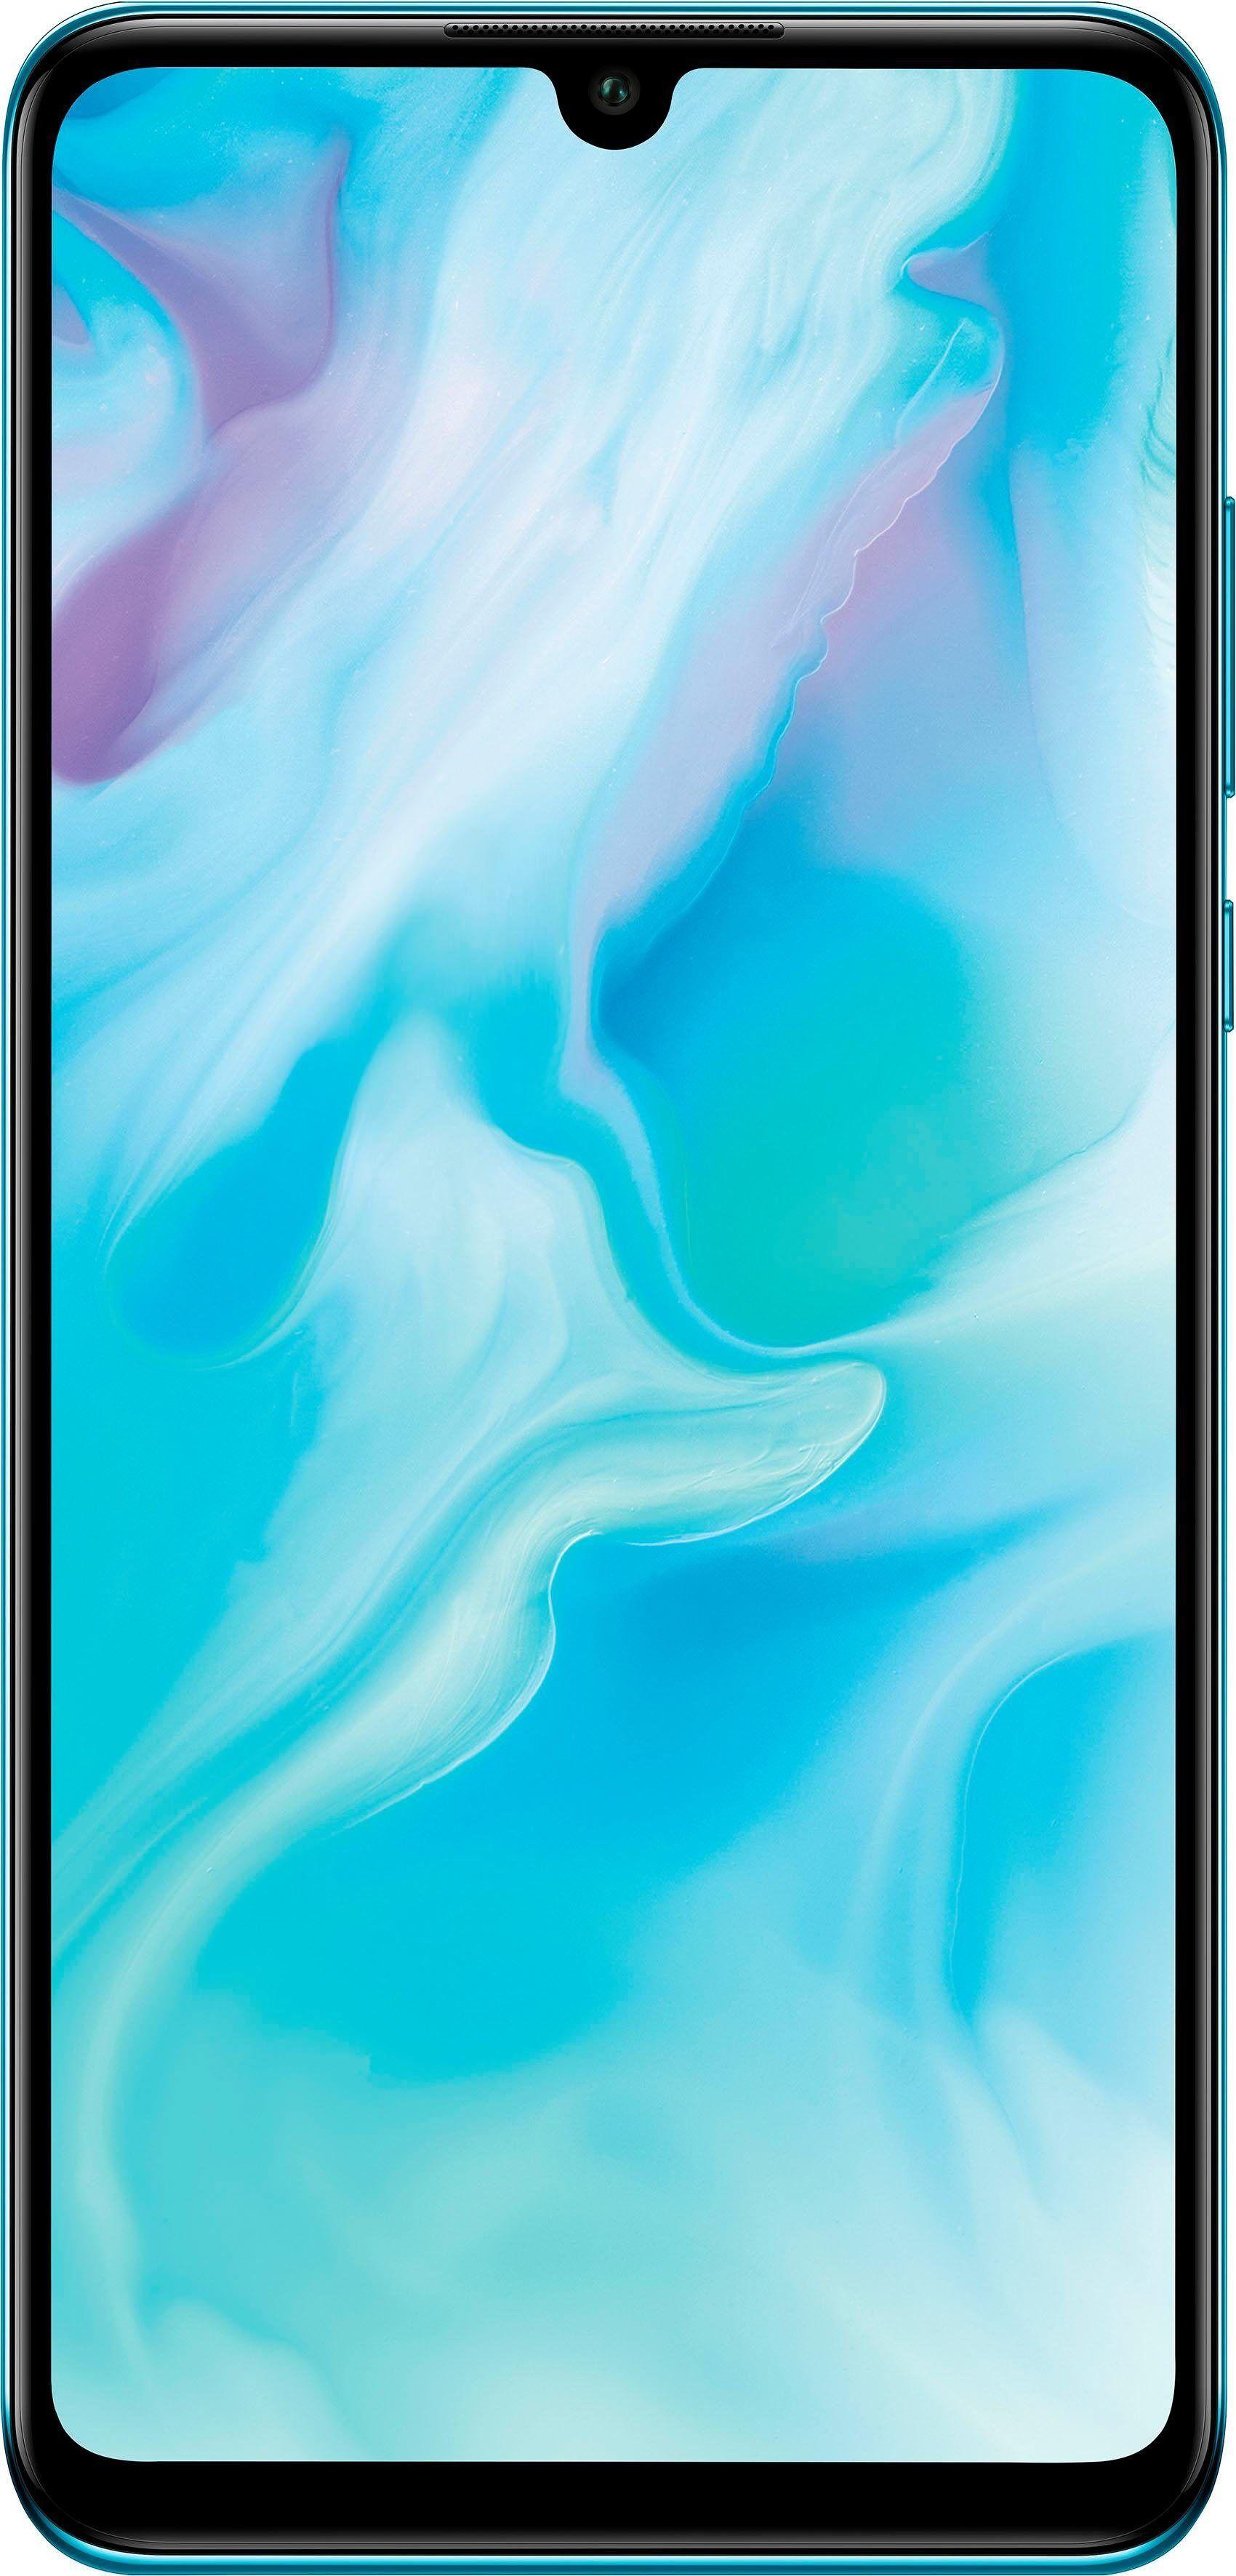 Huawei P30 lite Smartphone (15,62 cm/6,1 Zoll, 128 GB Speicherplatz, 48 MP Kamera), Breathing Crystal